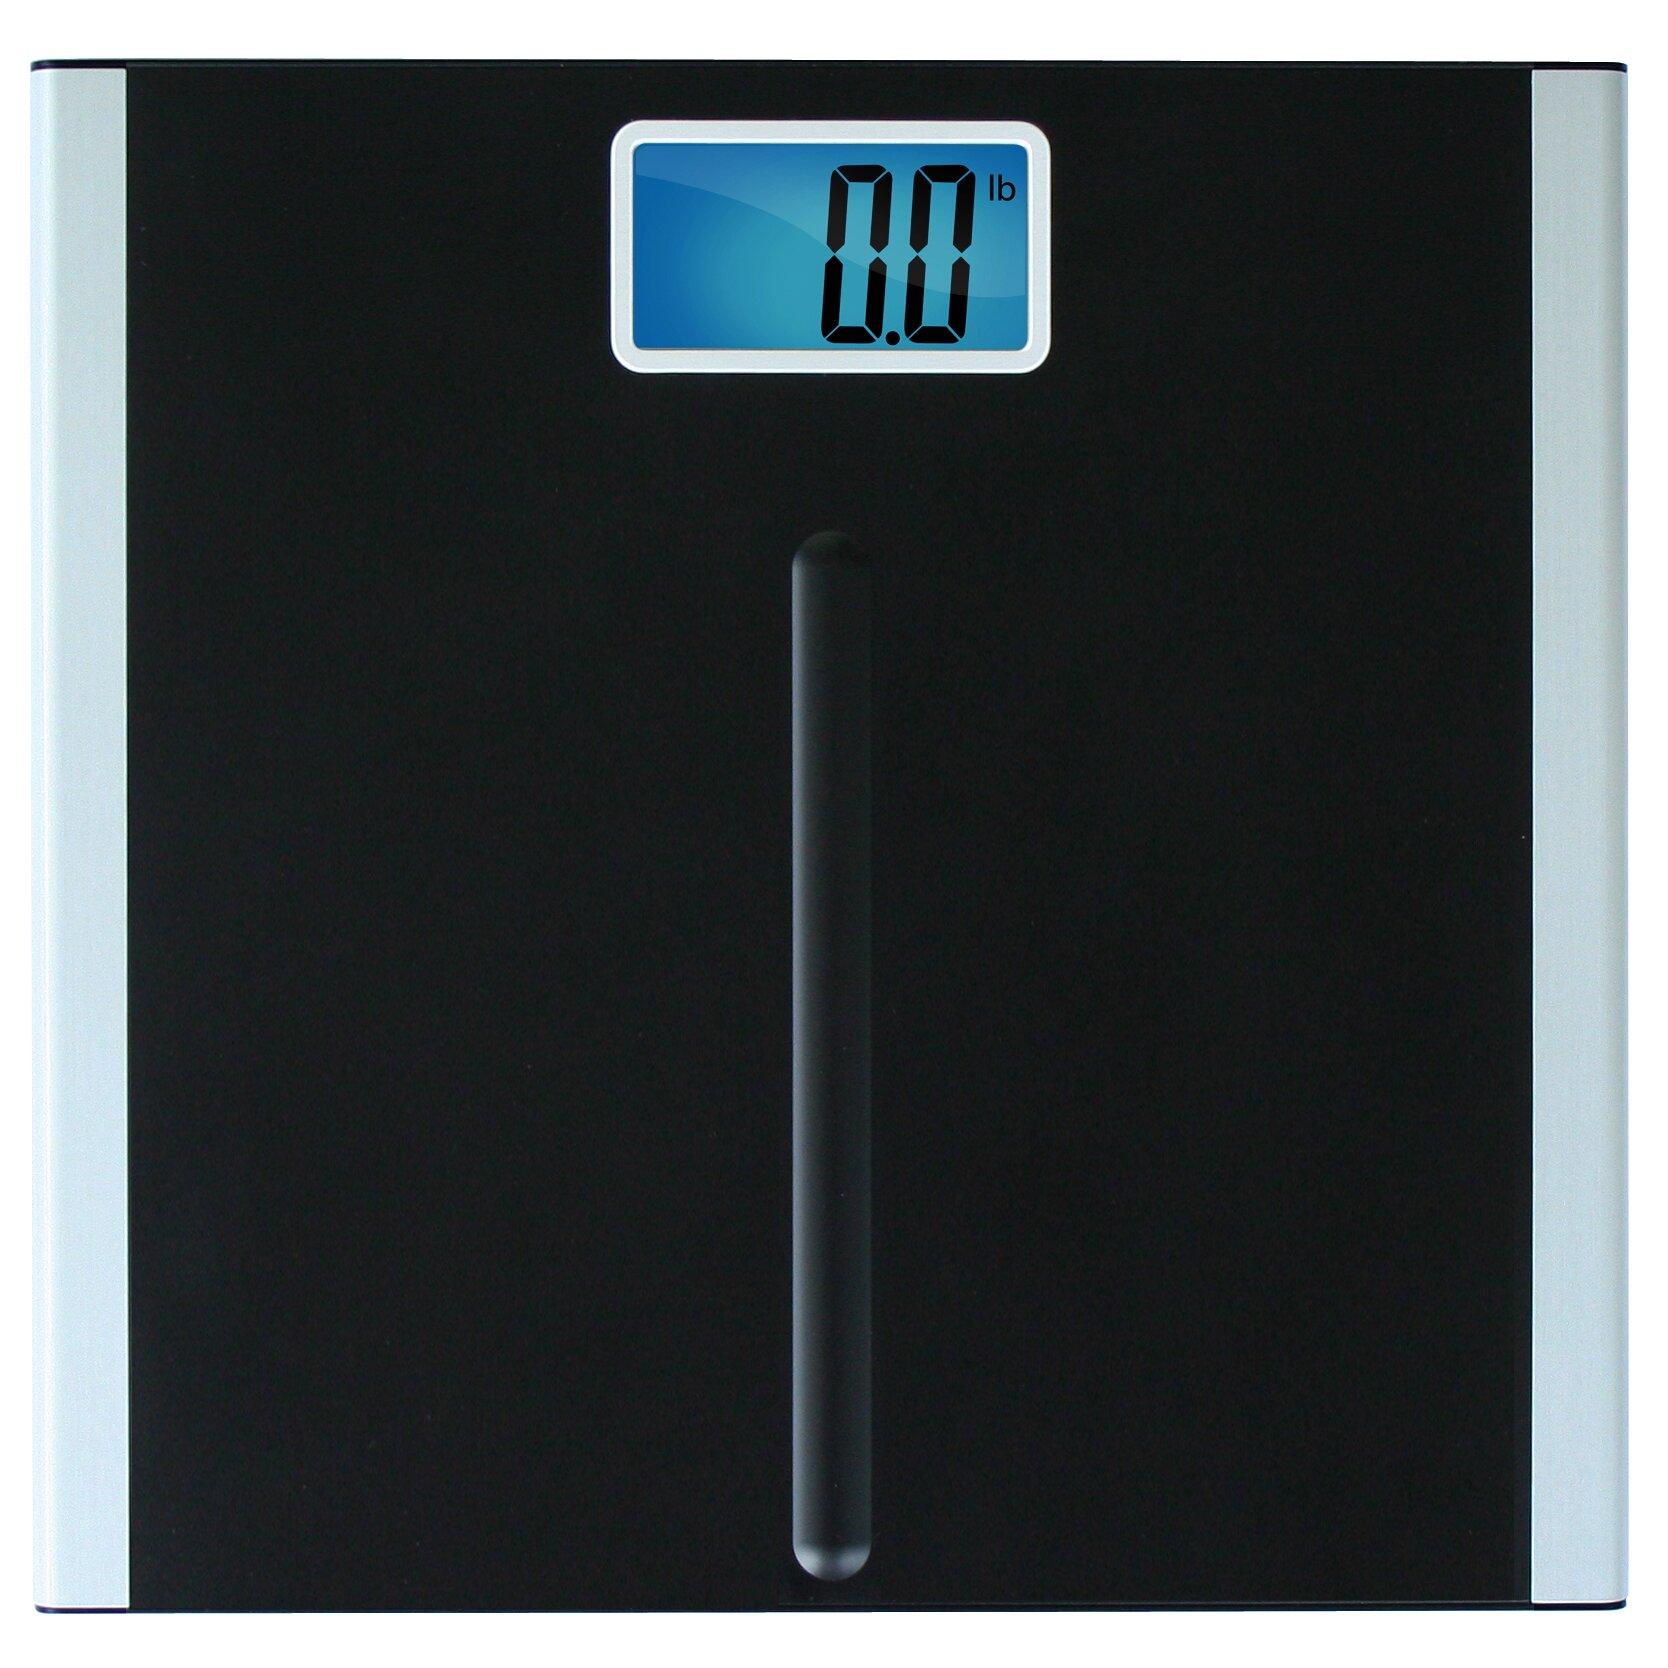 Product spotlight meet the eatsmart precision digital bathroom scale - Eatsmart Precision Premium Digital Bathroom Scale In Black Eatsmart Precision Premium Digital Bathroom Scale In